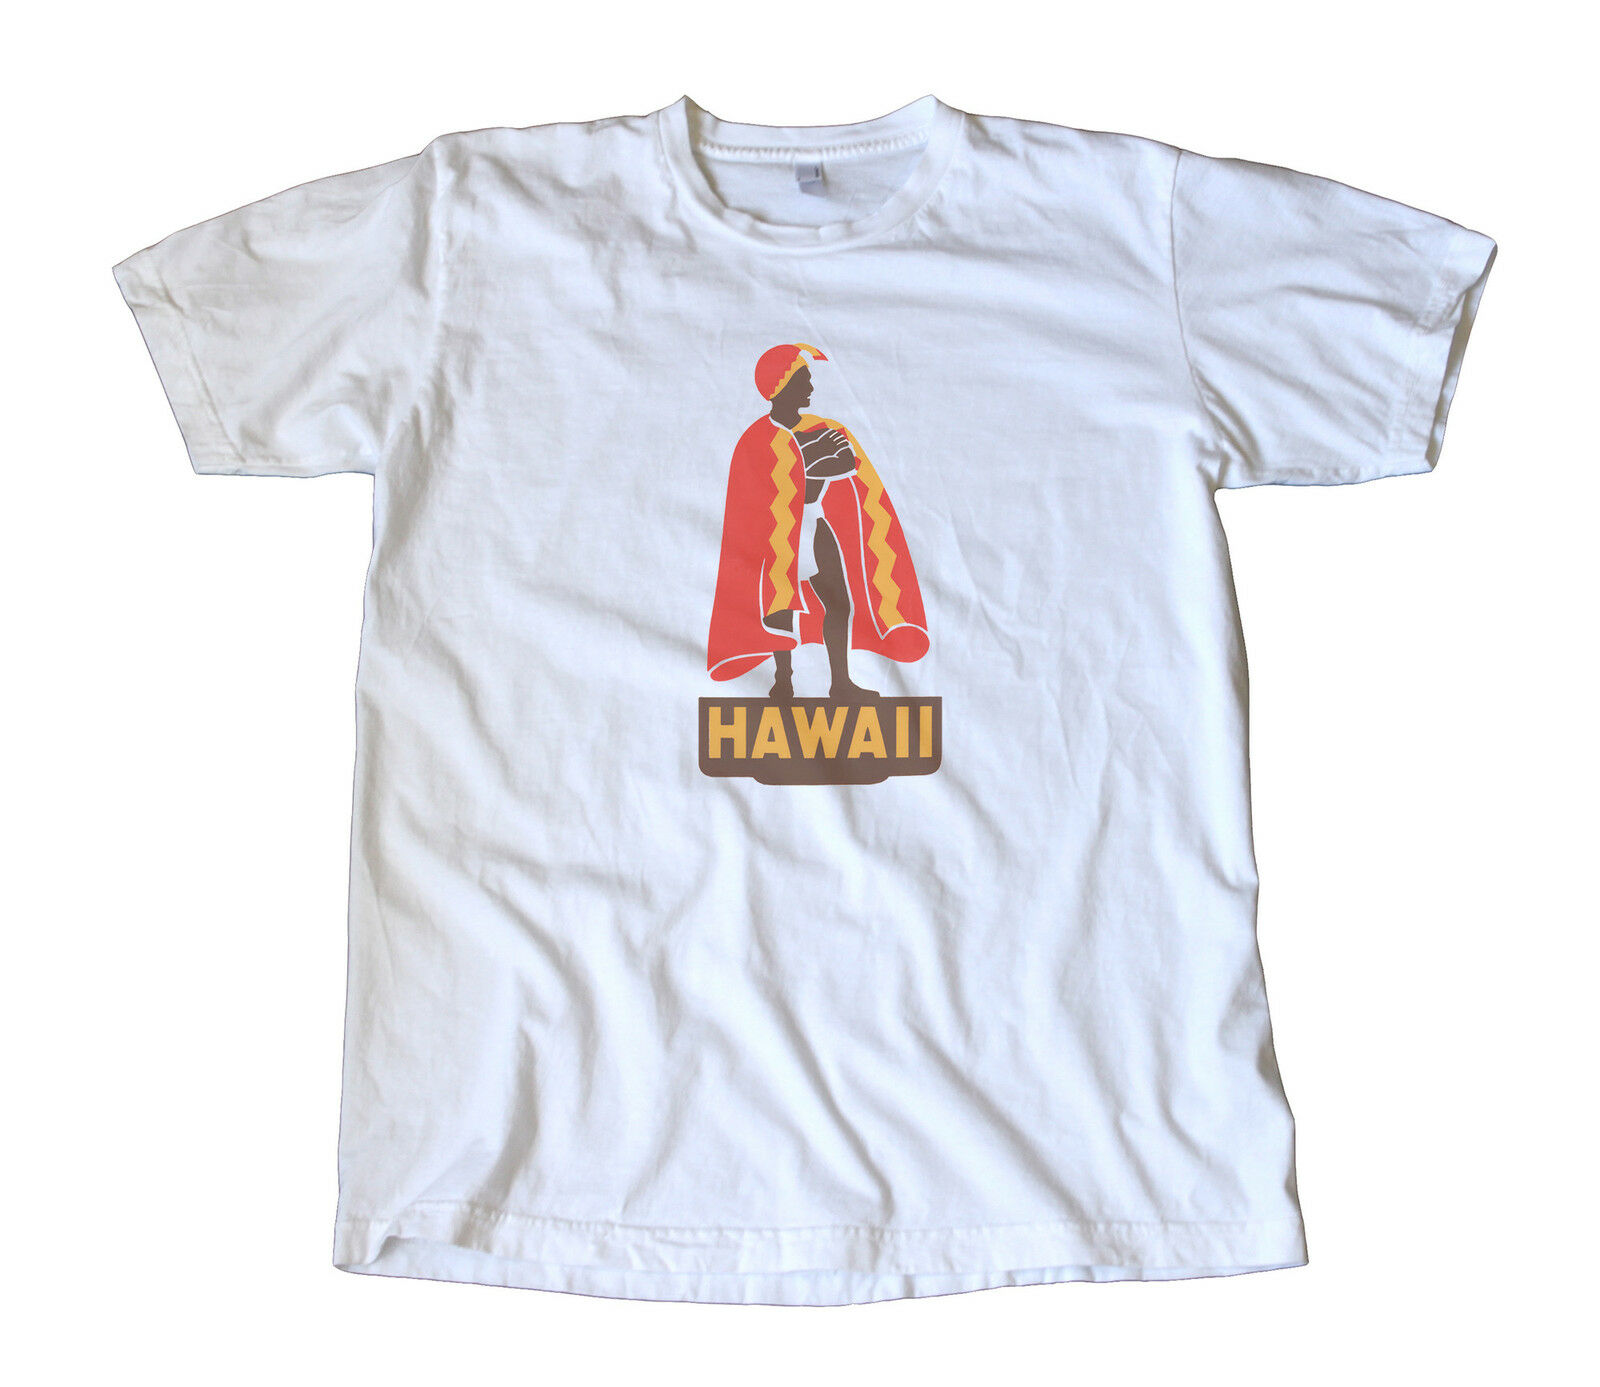 Hawaii Travel Decal T-Shirt - King Kamehameha, Maui, Honolulu, Islands